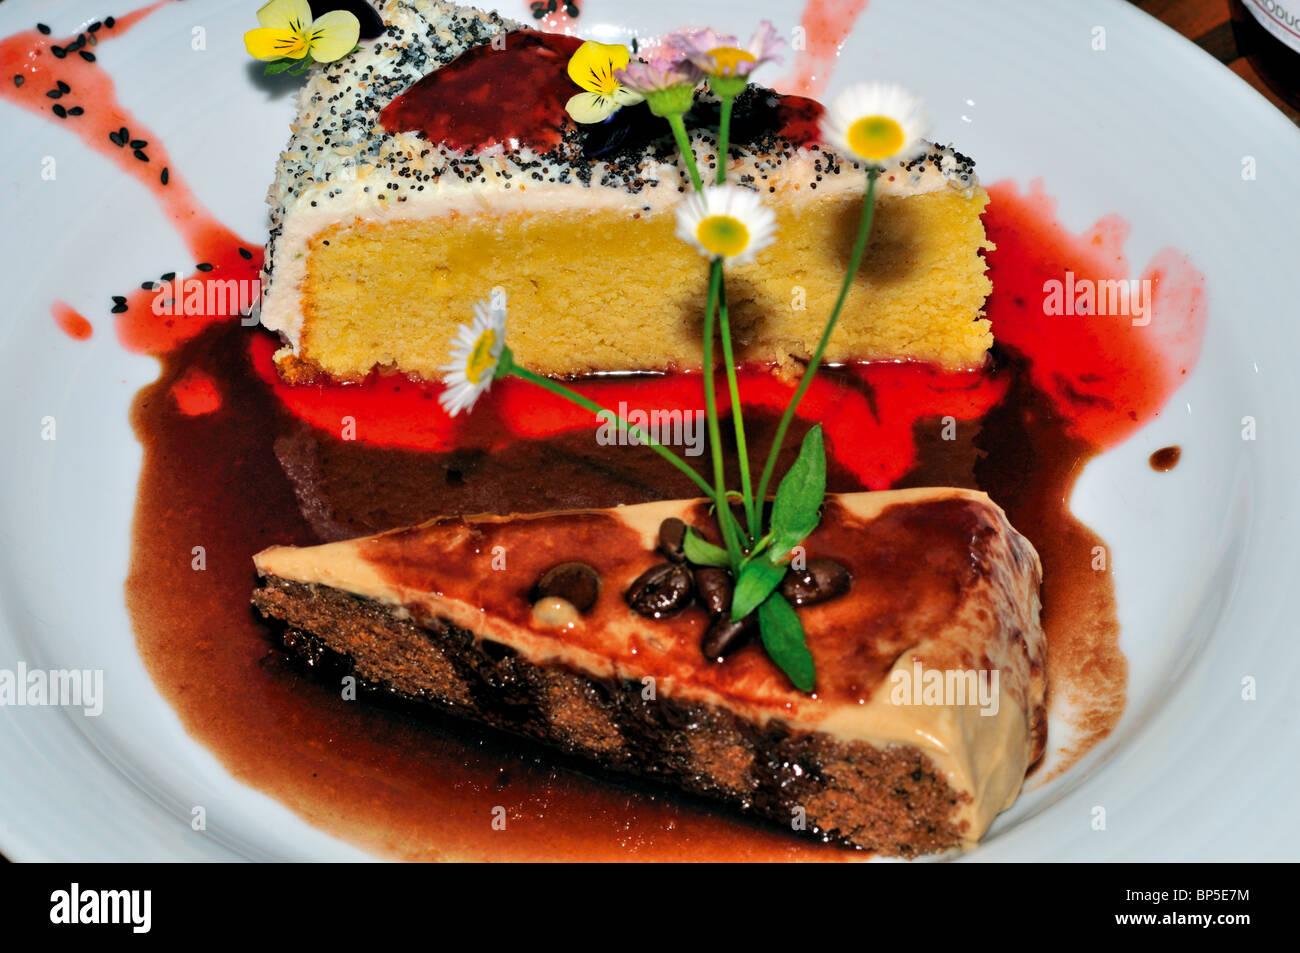 Portugal: Lemon and Carob Bean cakes in the restaurant Cor de Tangerina in Guimaraes - Stock Image